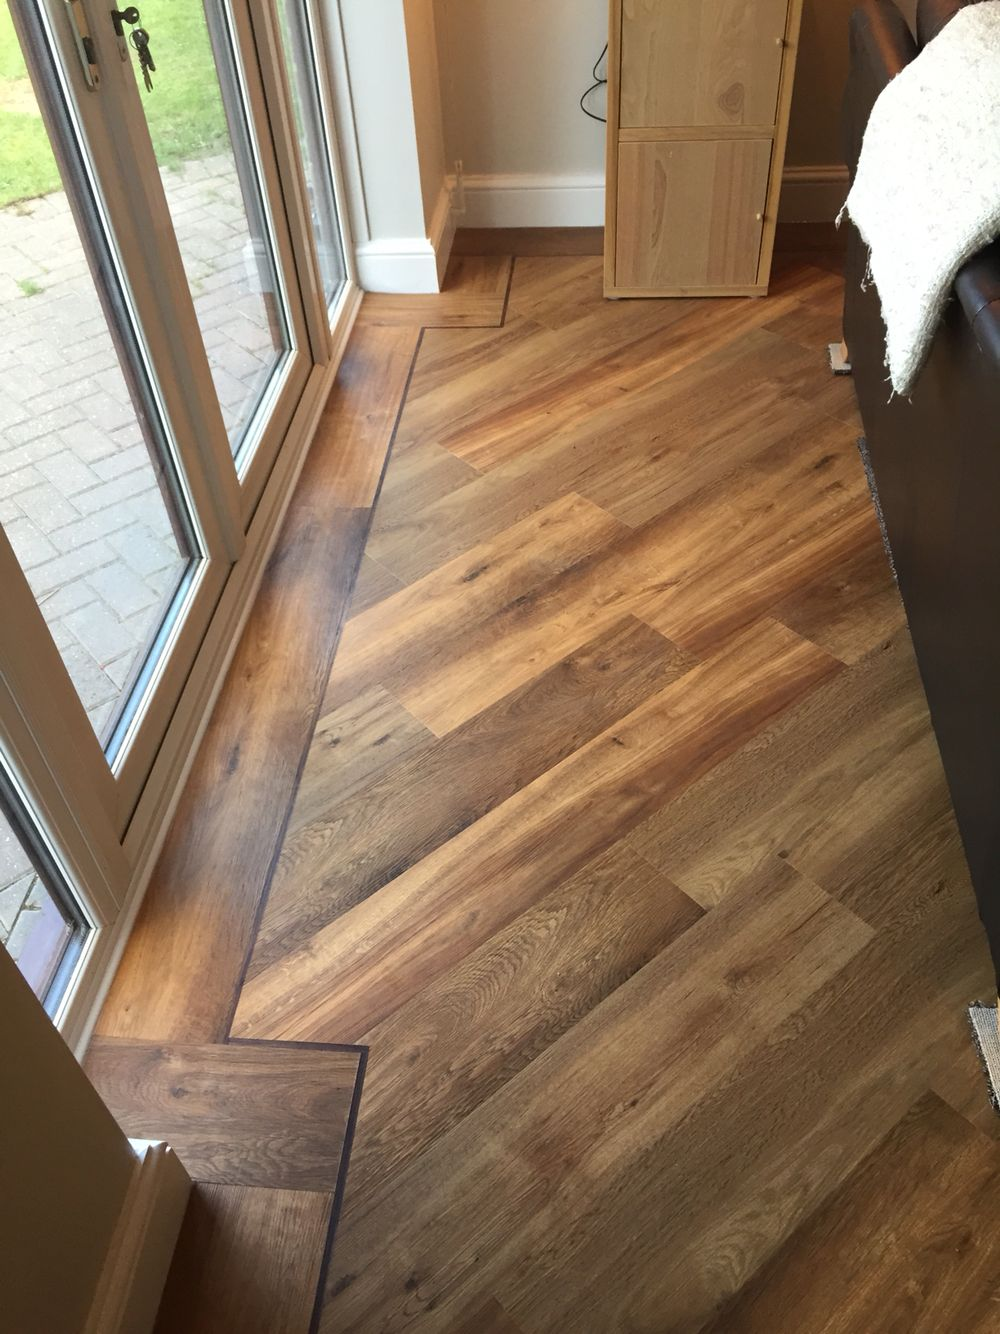 Karndean Flooring Van Gogh Classic Oak Flooring Laid